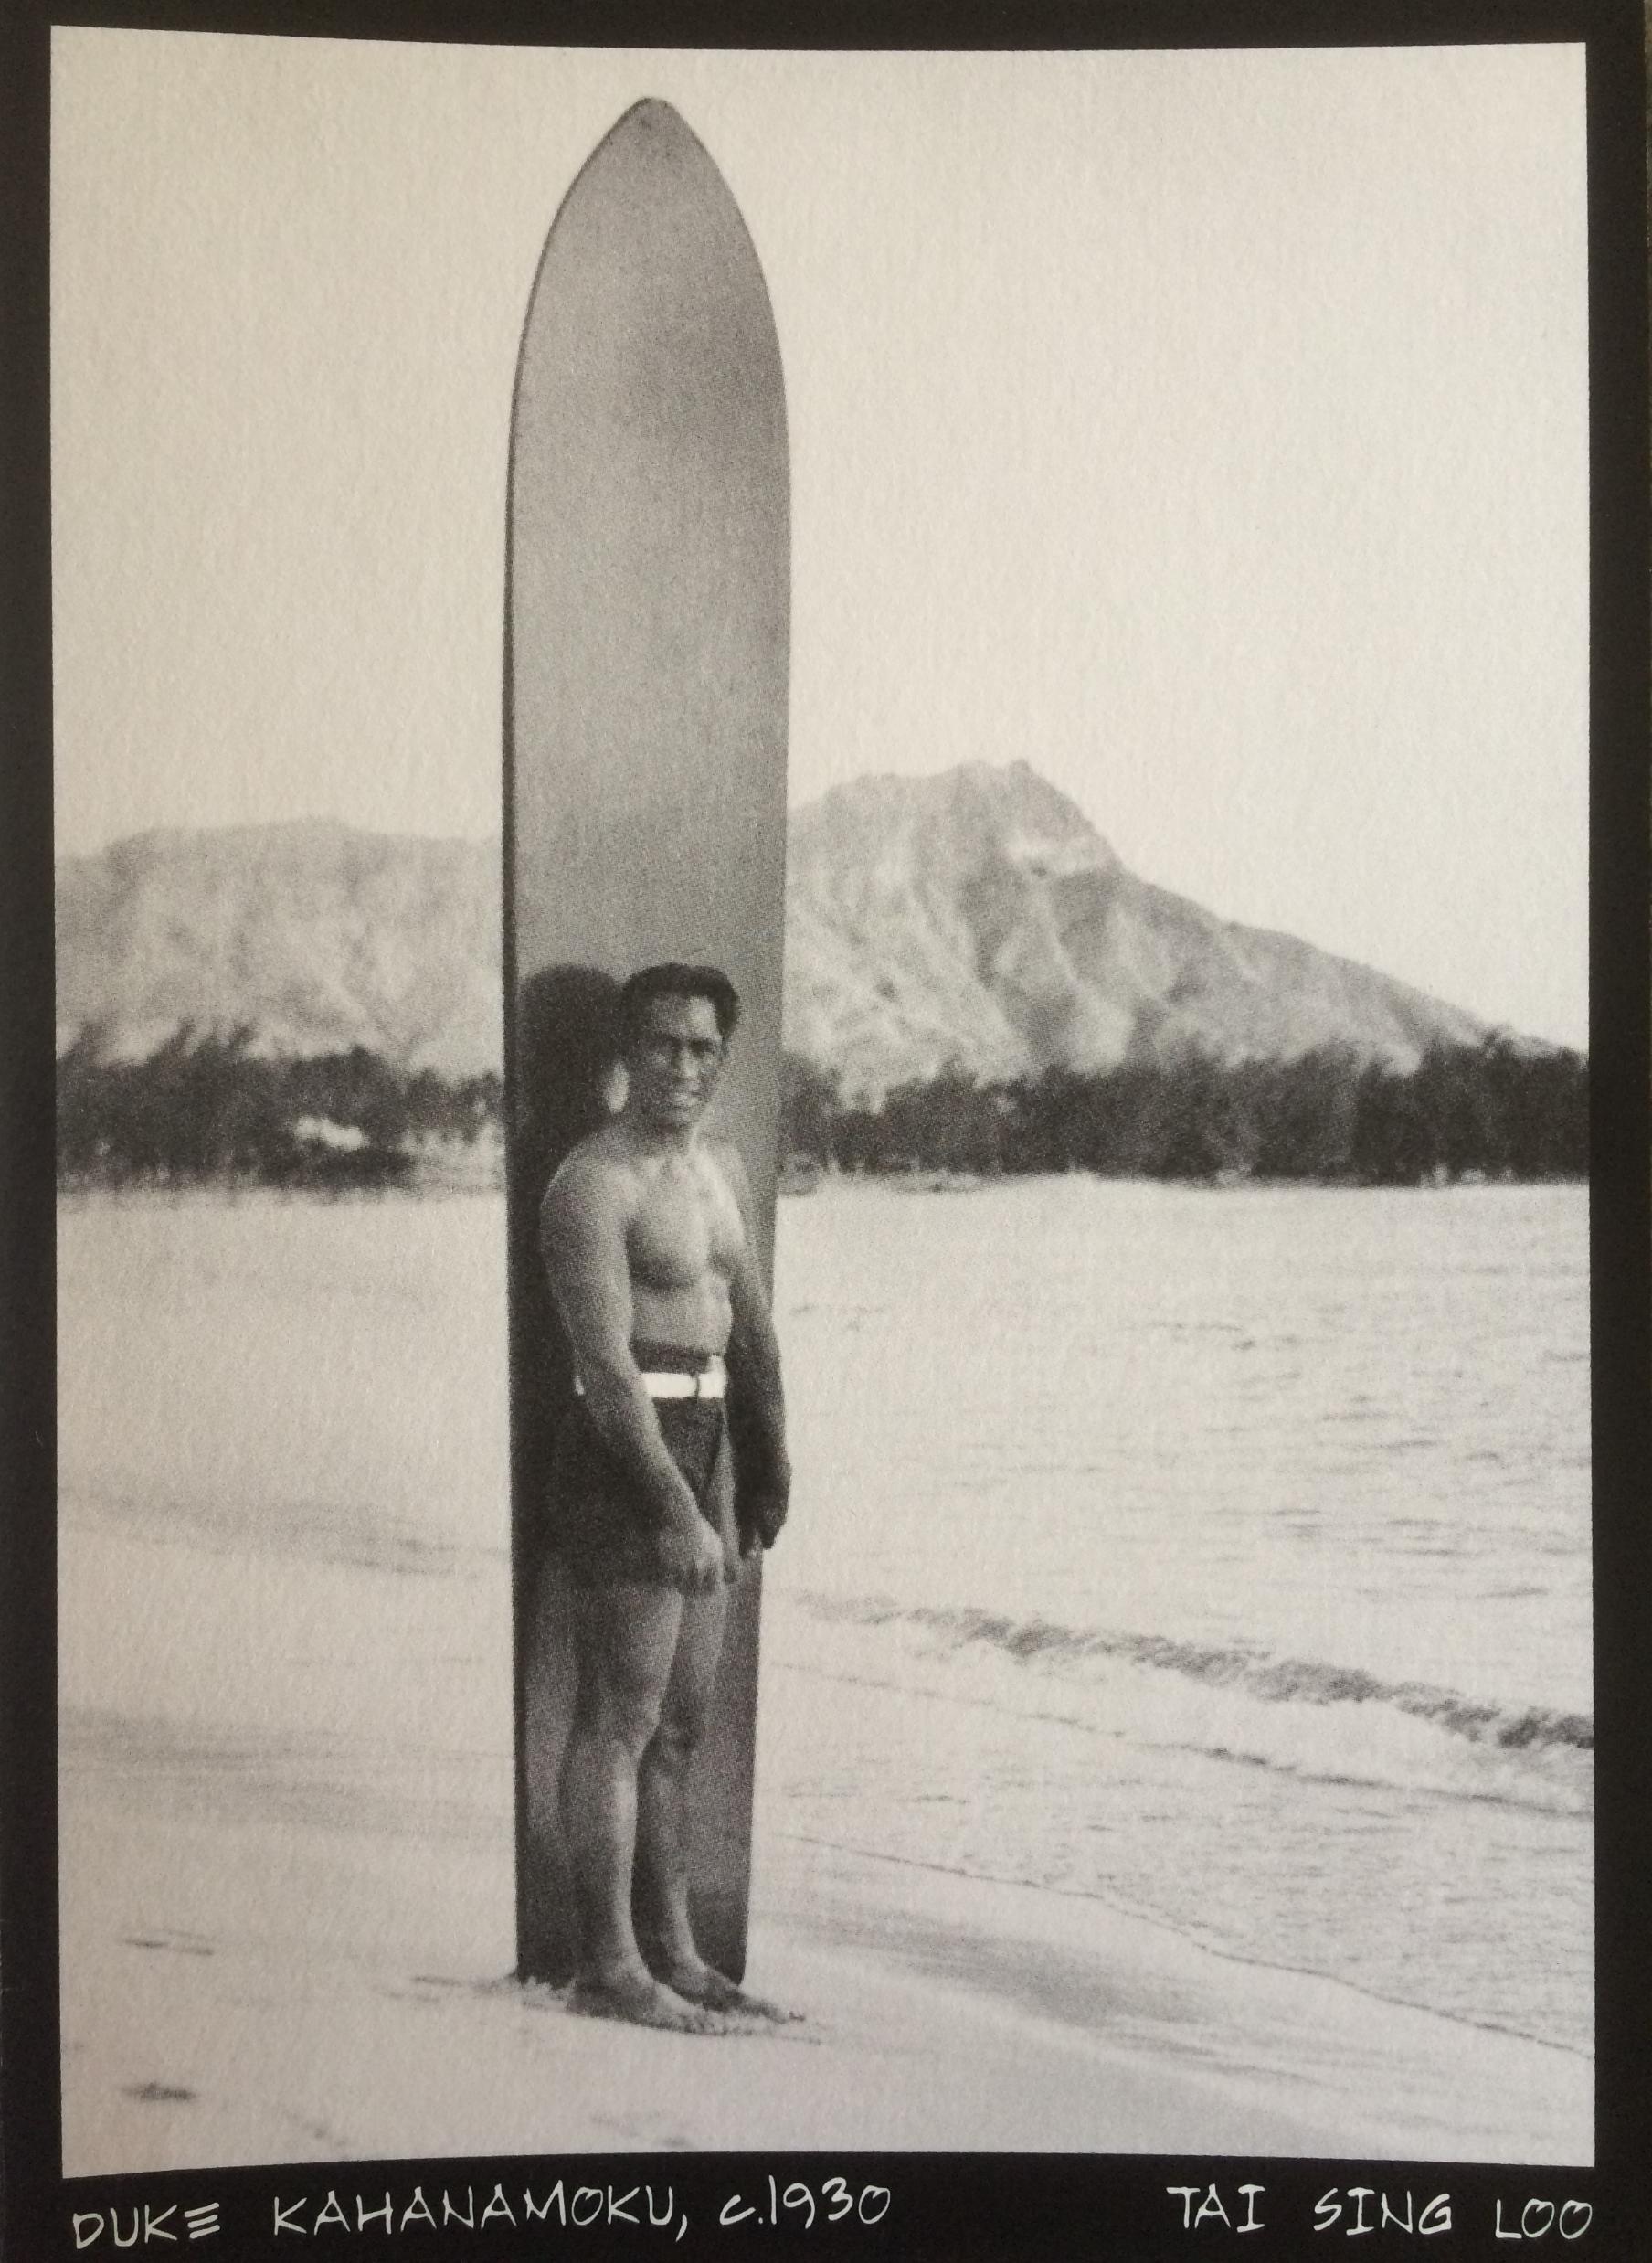 Duke Kahanamoku at Waikiki Beach, circa 1930